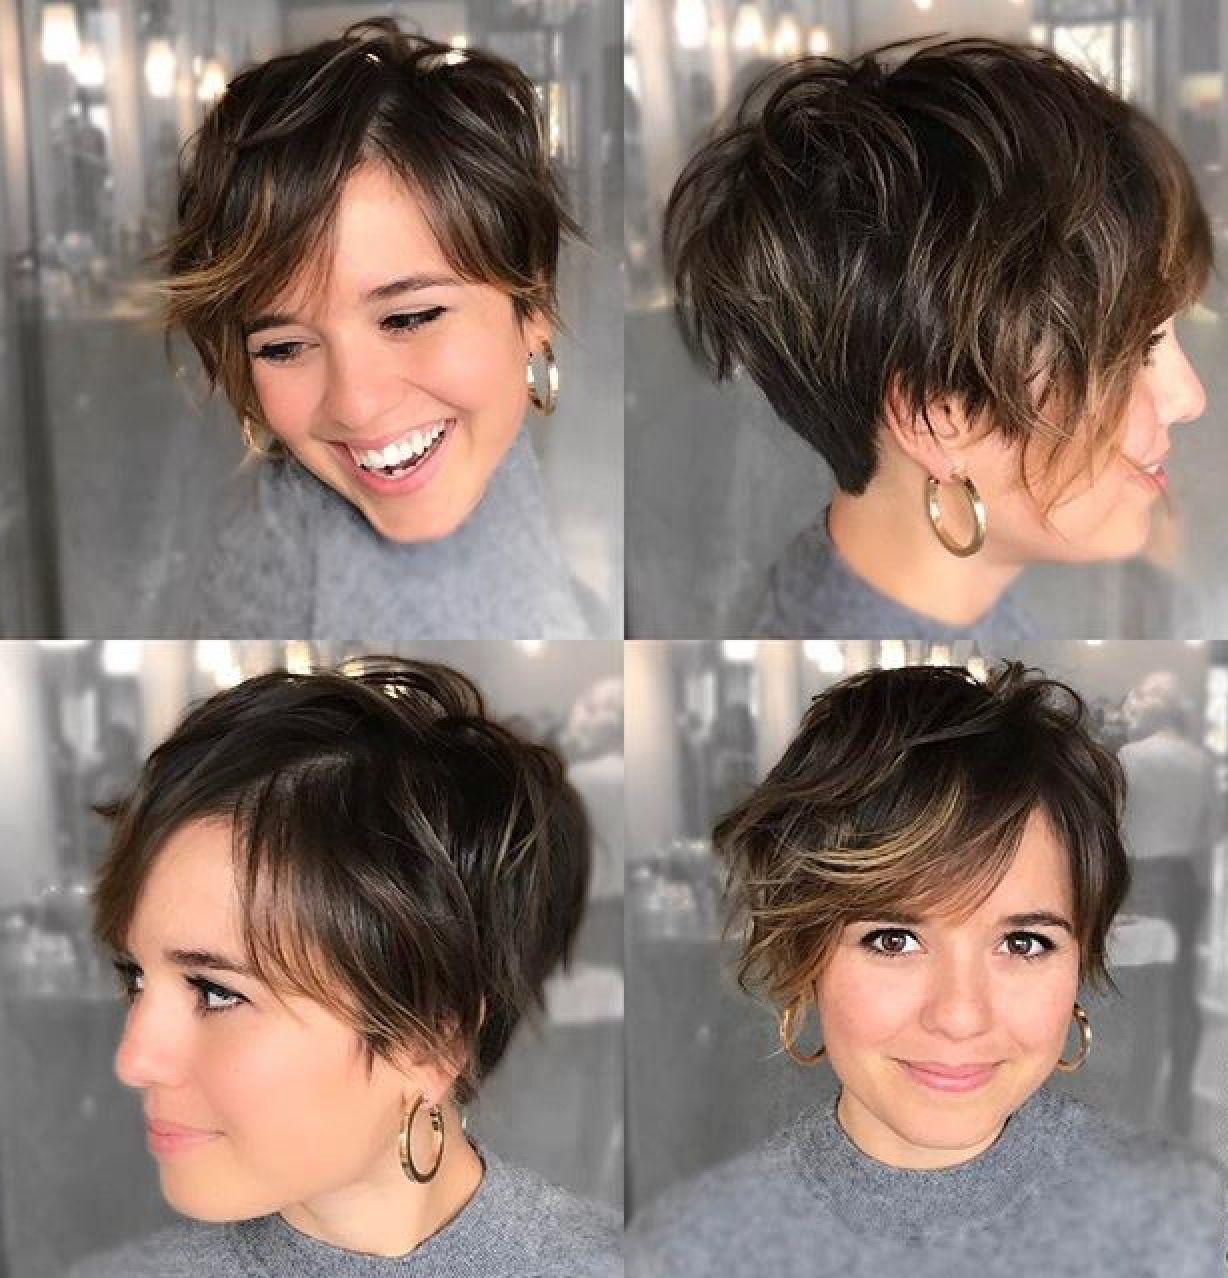 Pin By Amanda Sue On Hair Makeup Short Hair Styles For Round Faces Short Hair Undercut Short Hair With Bangs